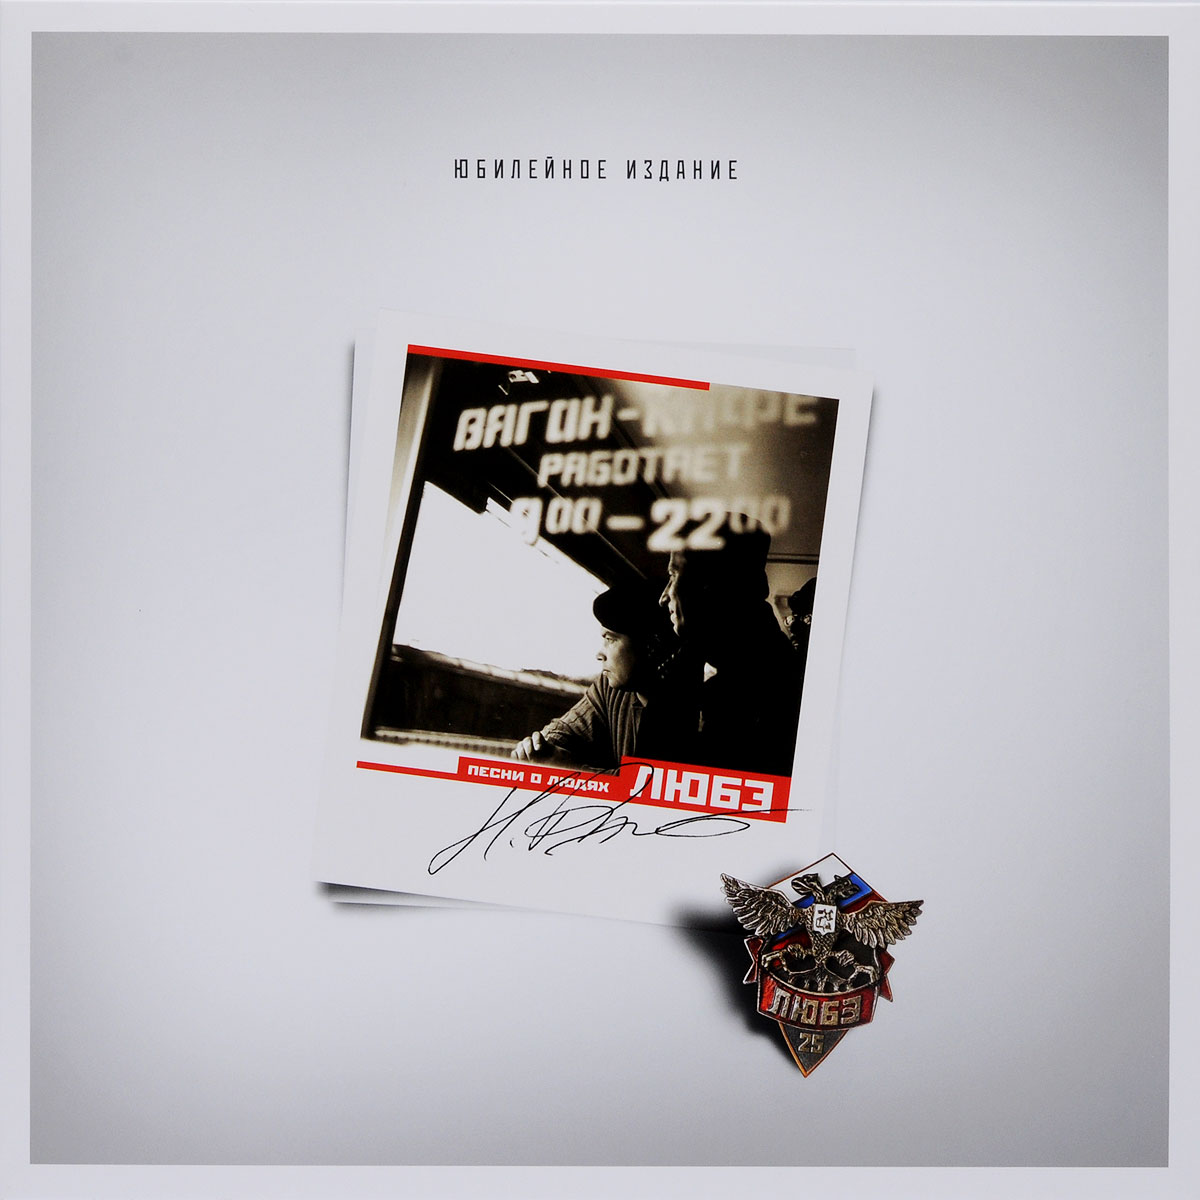 LP 1:Tracks 1 - 4 LP 2:Tracks 5 - 9